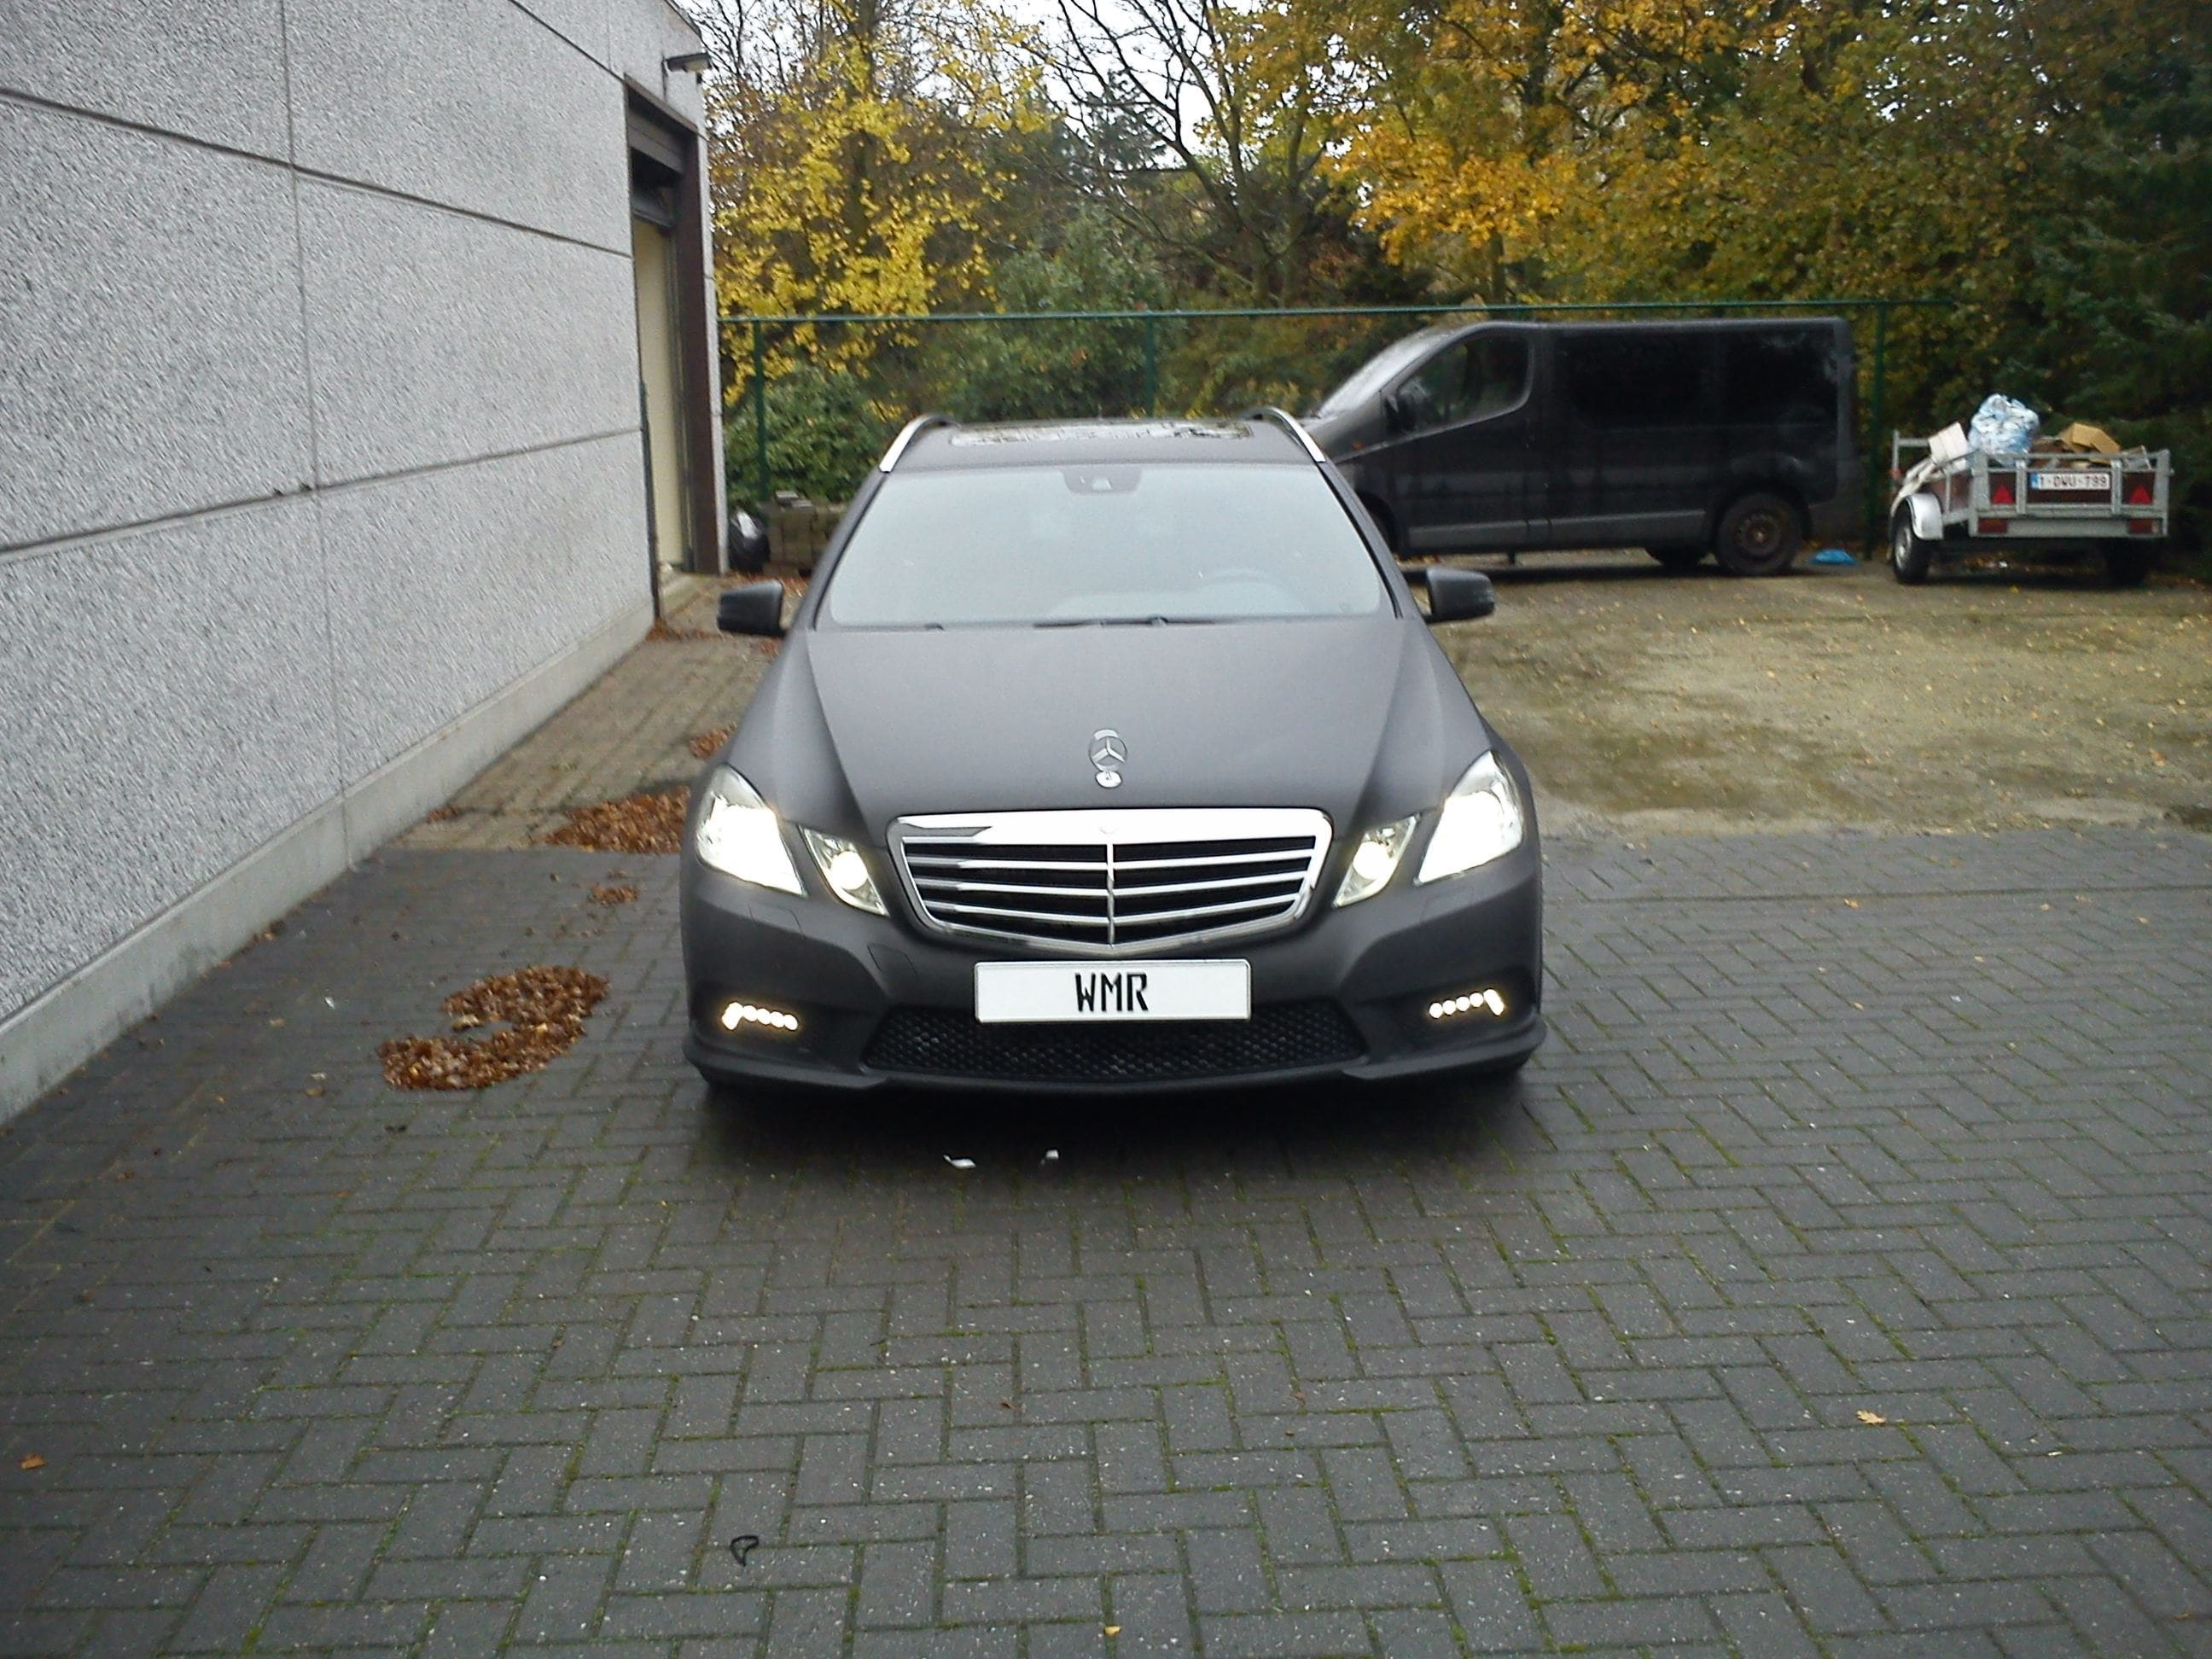 Mercedes E320 met Mat Zwarte Wrap, Carwrapping door Wrapmyride.nu Foto-nr:6225, ©2020